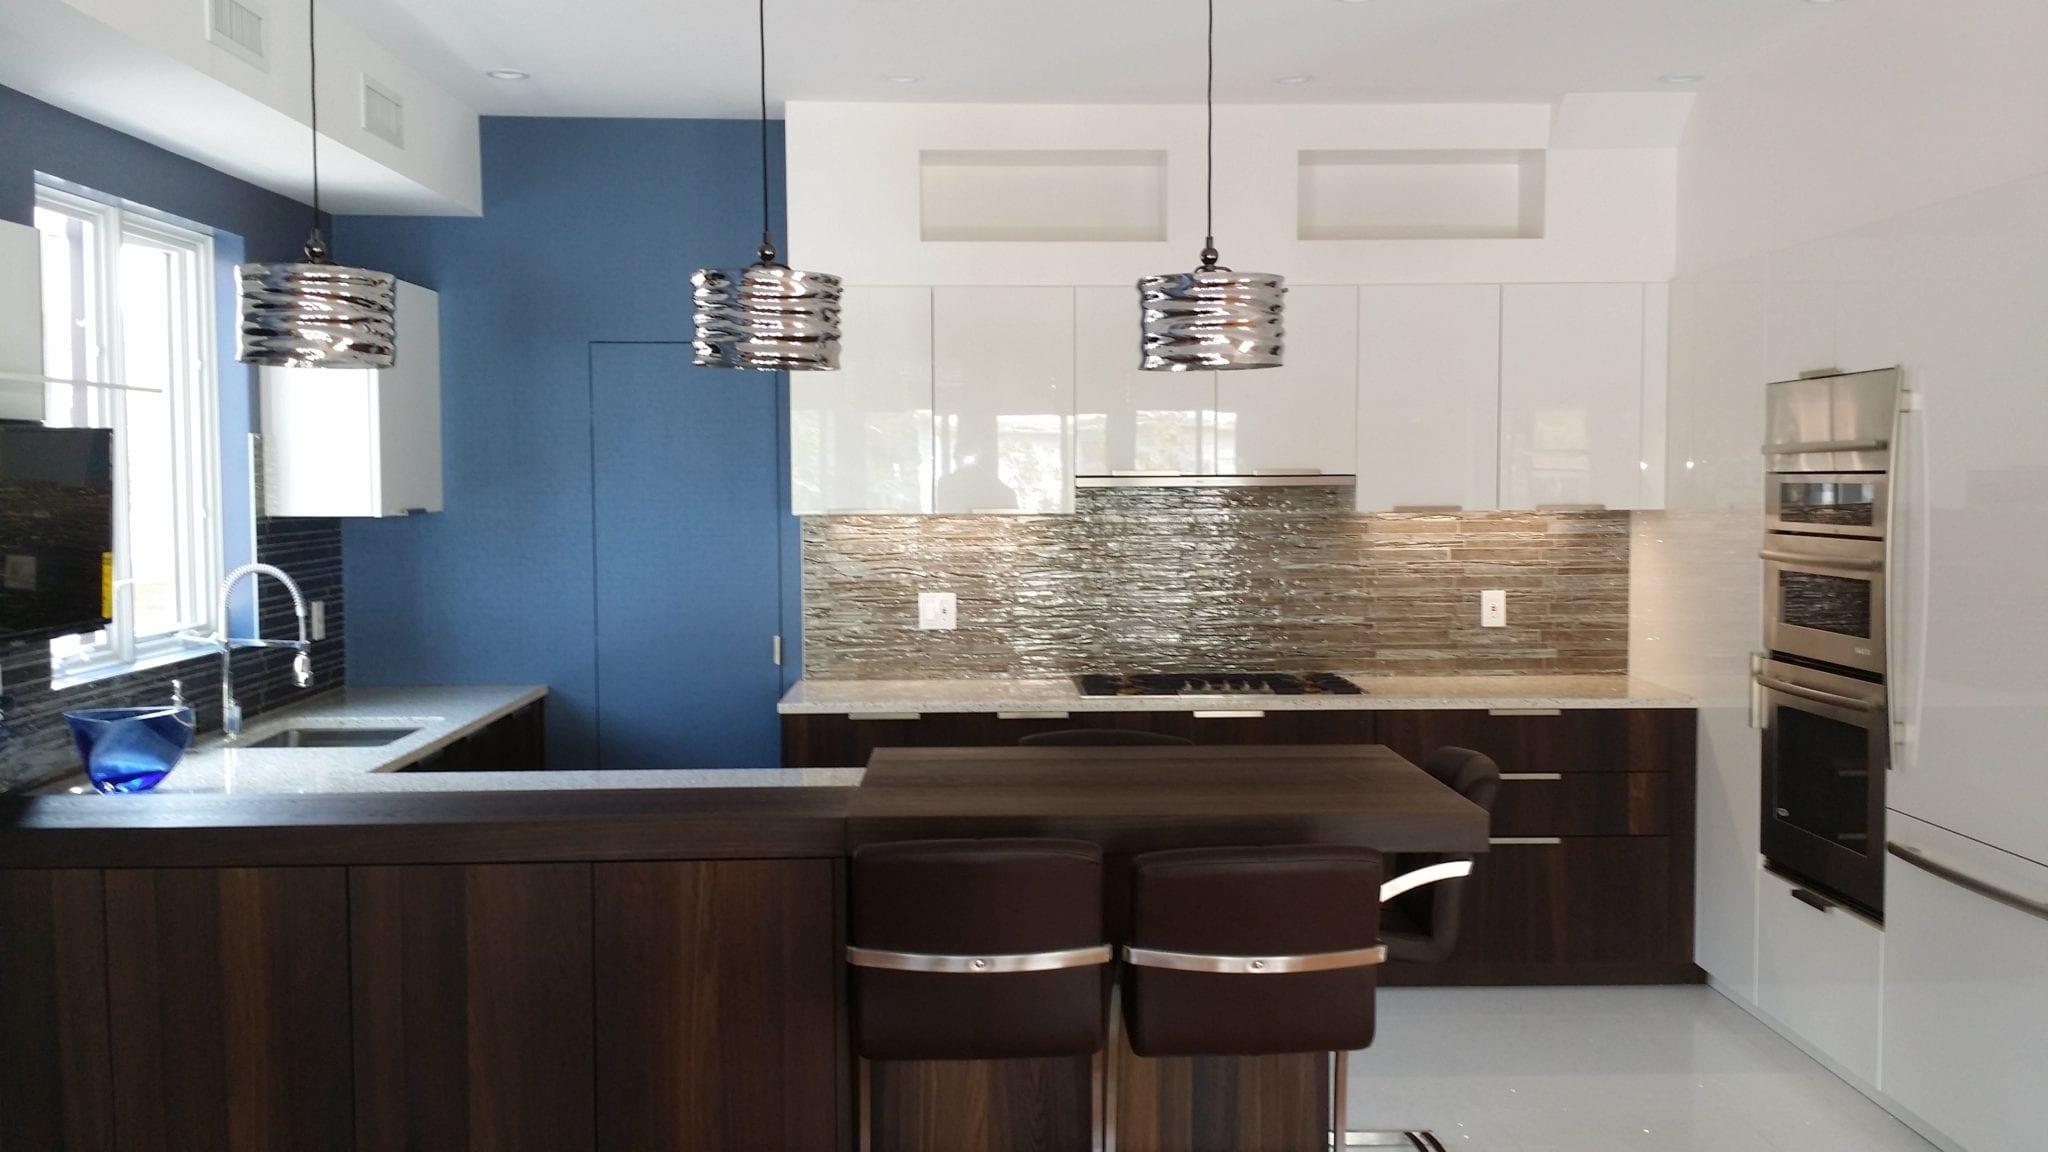 Dark wood veneer, high gloss lacquer, quartz counter,